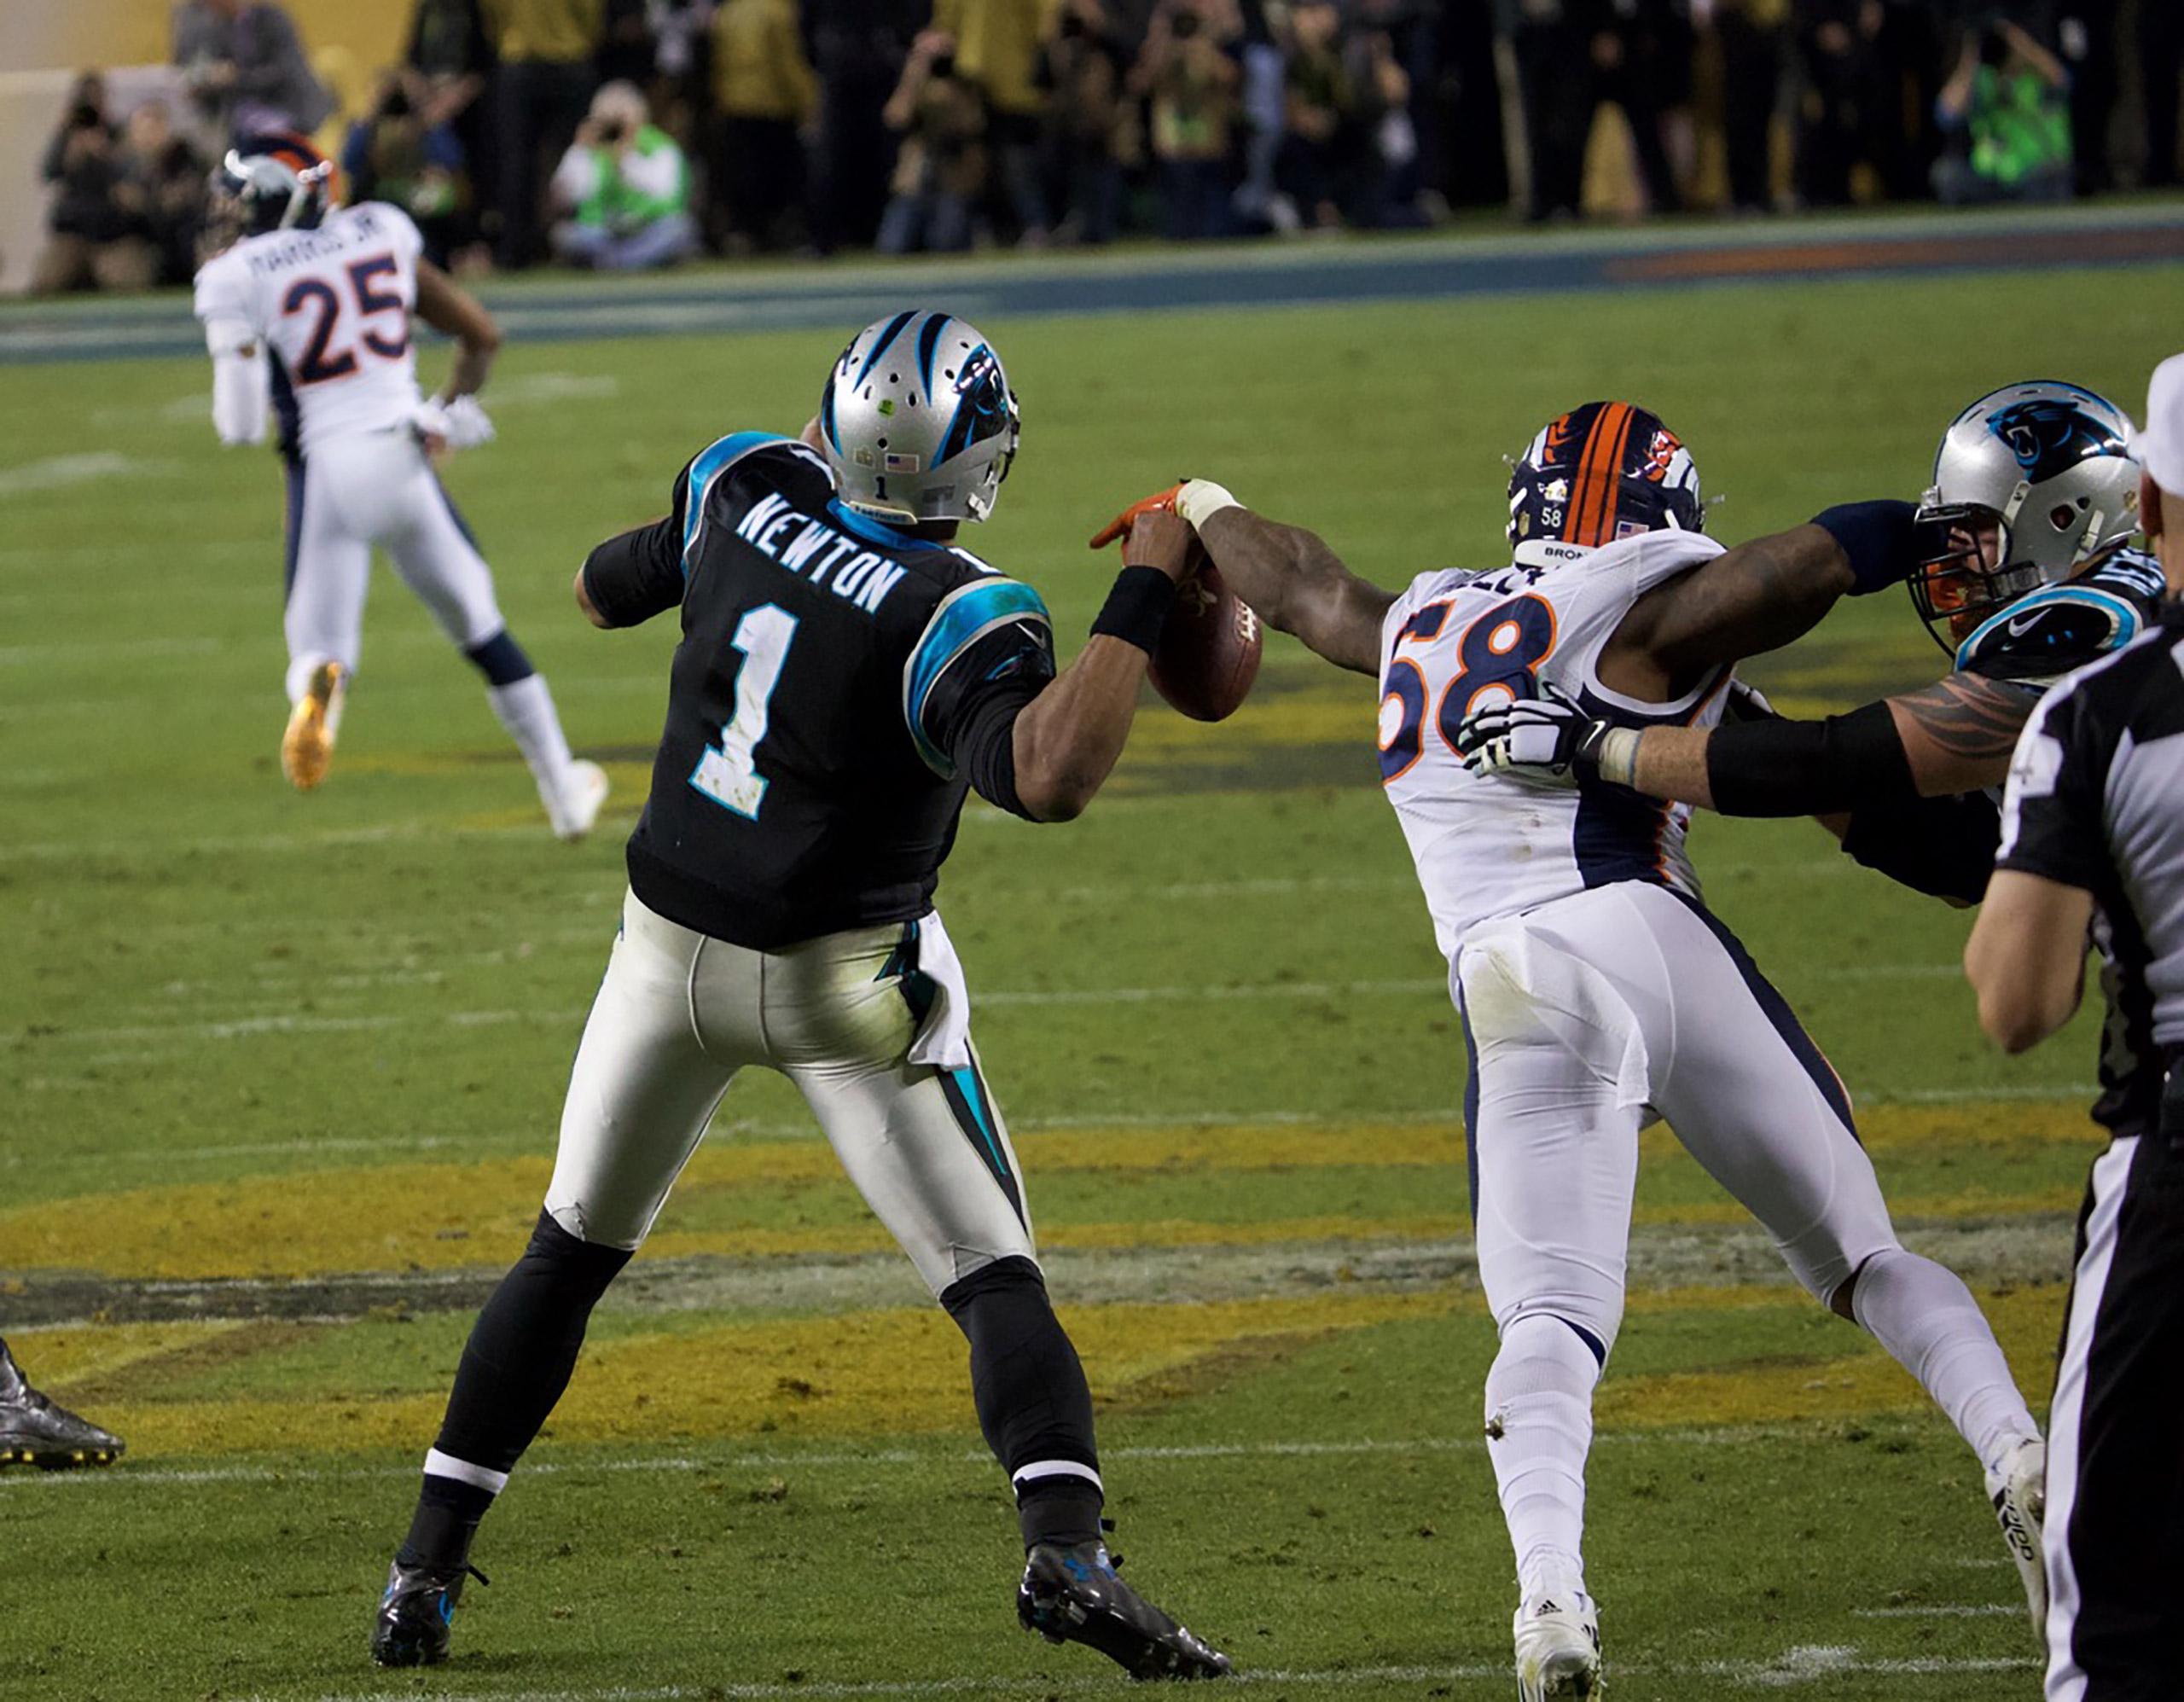 Super Bowl L Feb. 7, 2016                               Denver Broncos vs Carolina Panthers in Santa Clara, Calif.